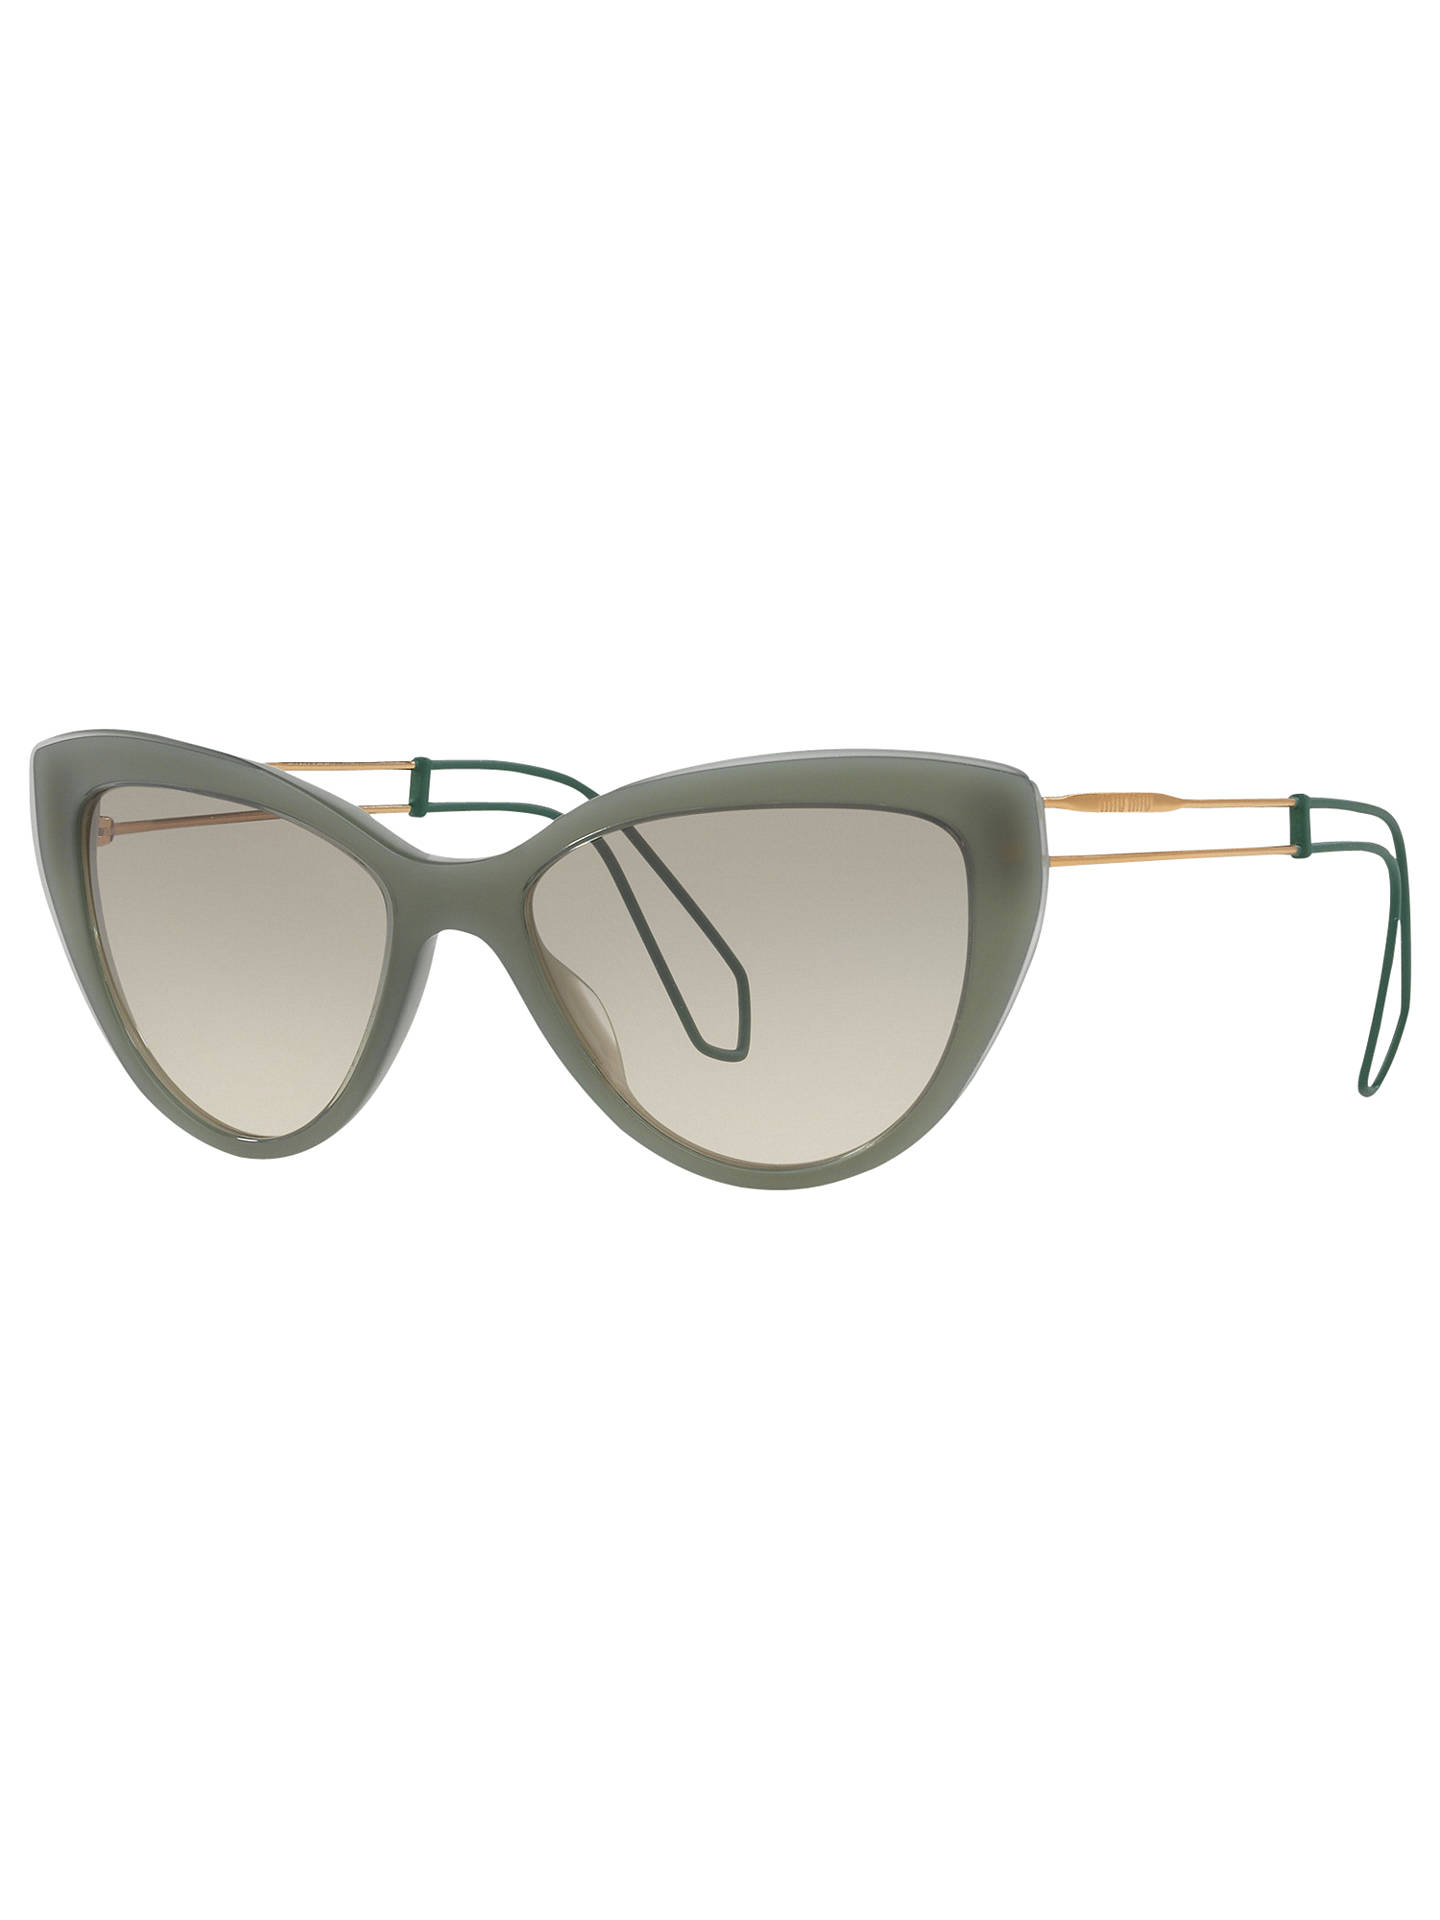 68c3d9d3c735 Buy Miu Miu MU 12RS Cat s Eye Sunglasses